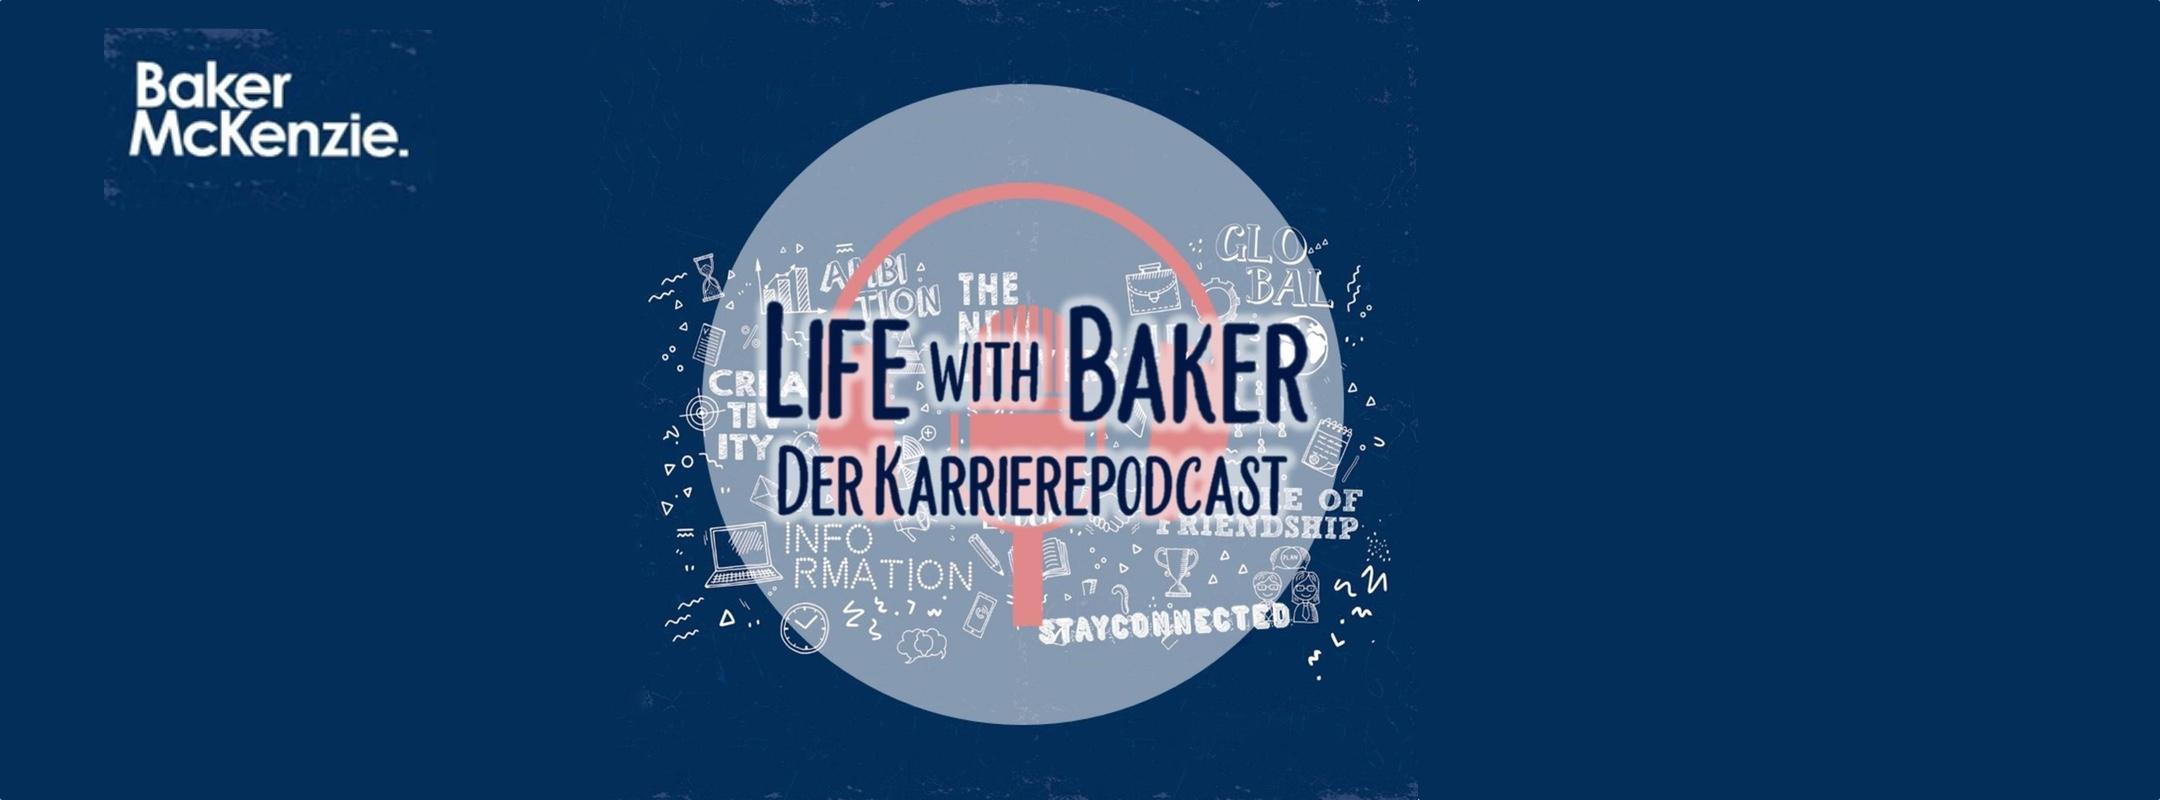 Life with Baker - der Karrierepodcast